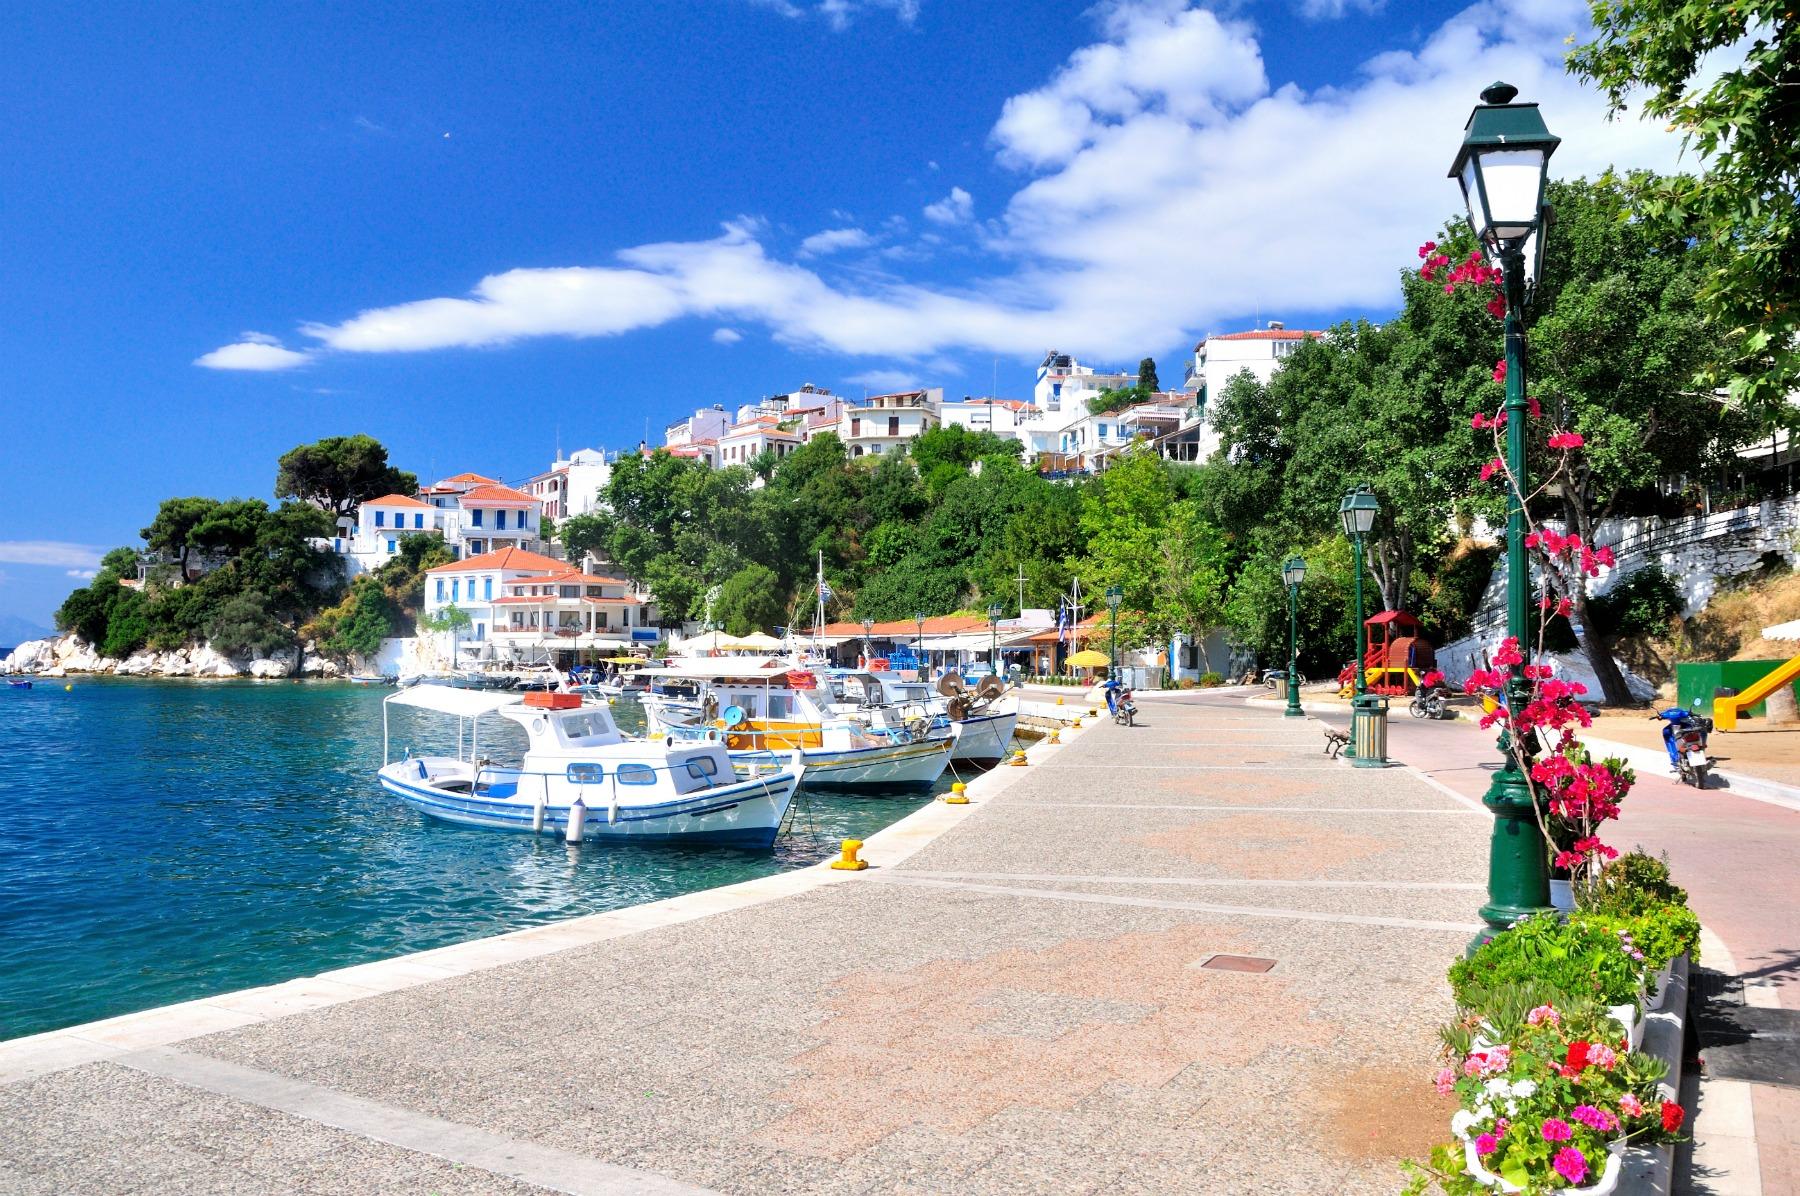 Skiathos_old_port_fishing_boats_1800x1196.jpg